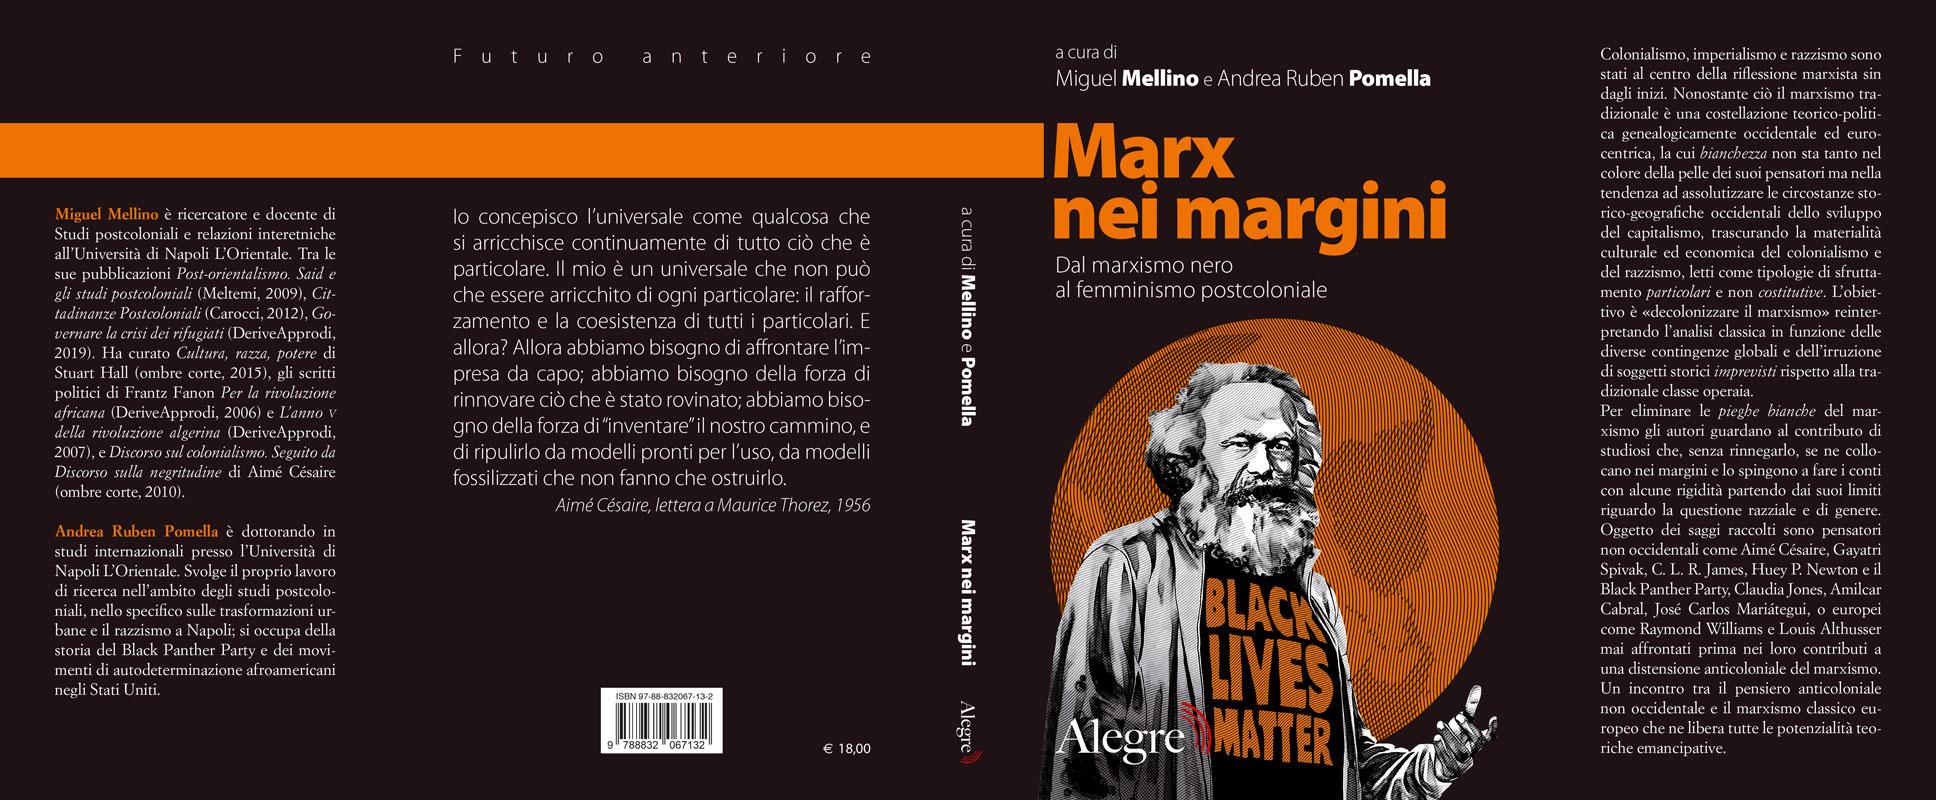 Marx nei margini copertina stesa